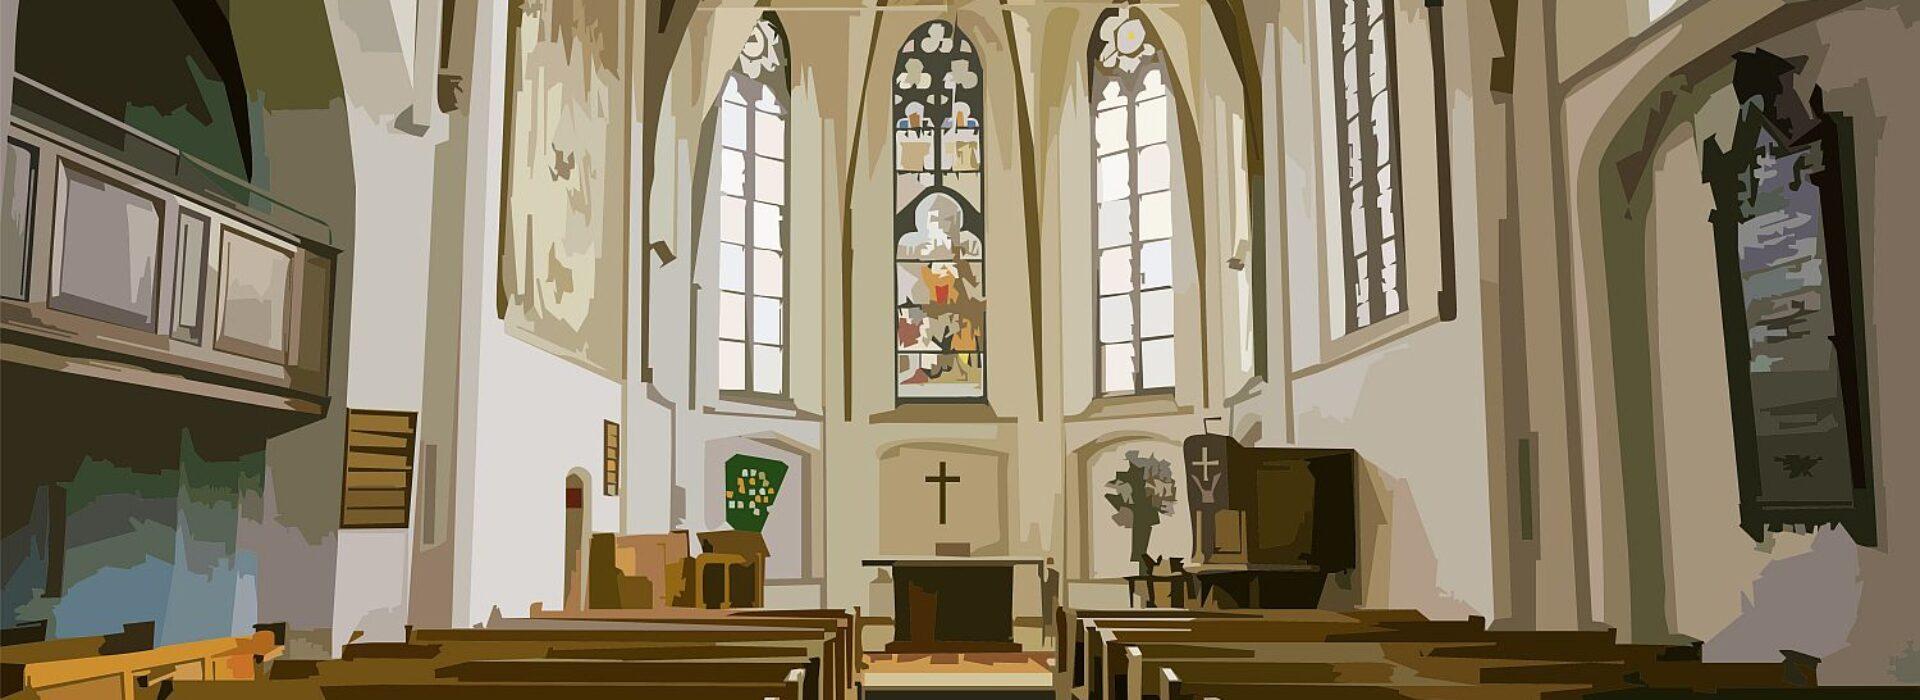 Biserica Protestantă Evanghelică